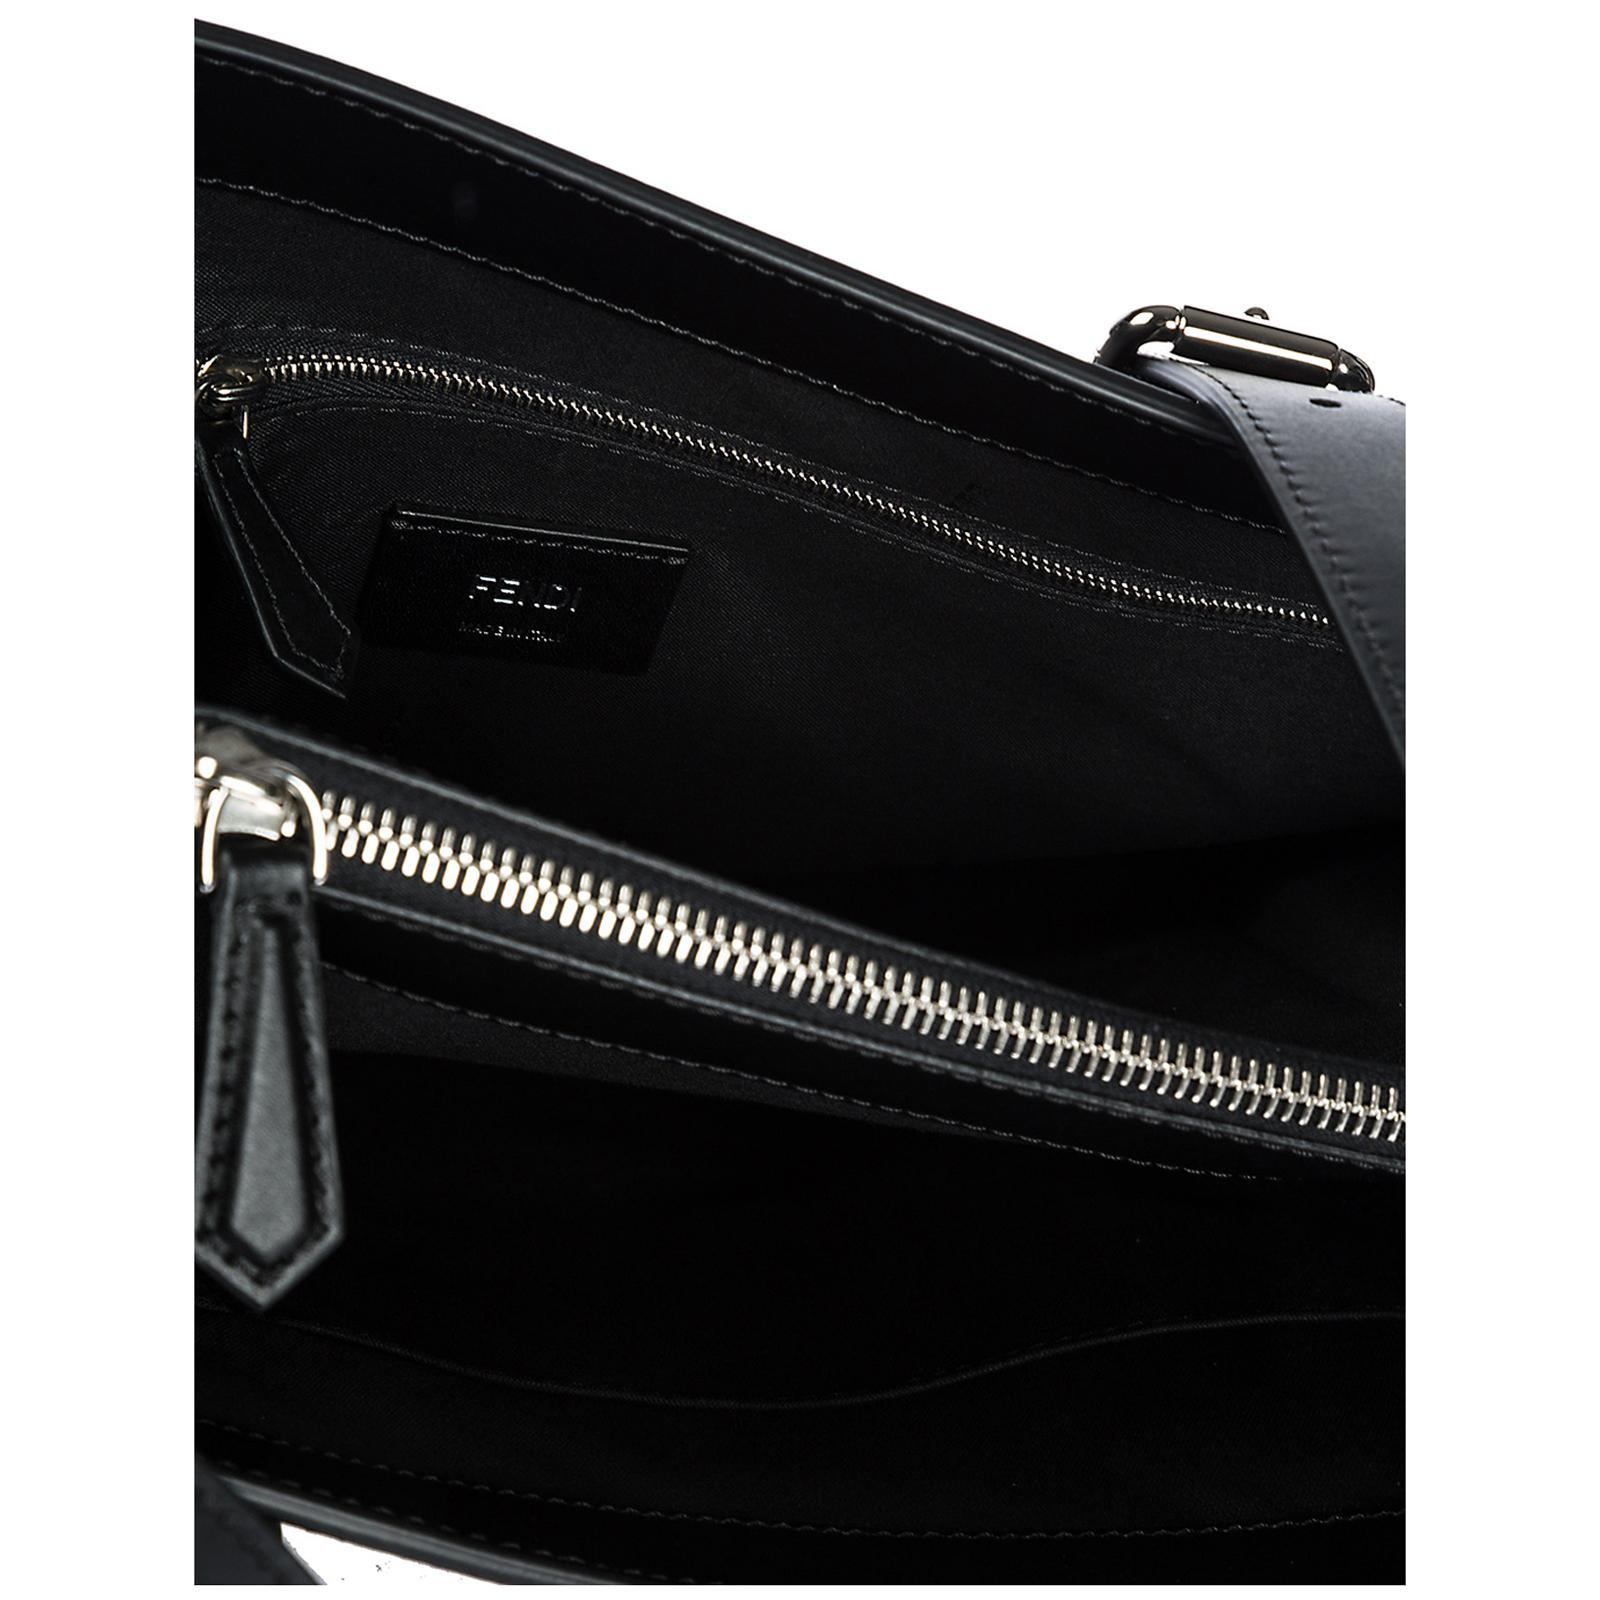 ef7a4f905c Lyst - Fendi Bag Handbag Shopping Tote Pelle in Black - Save ...